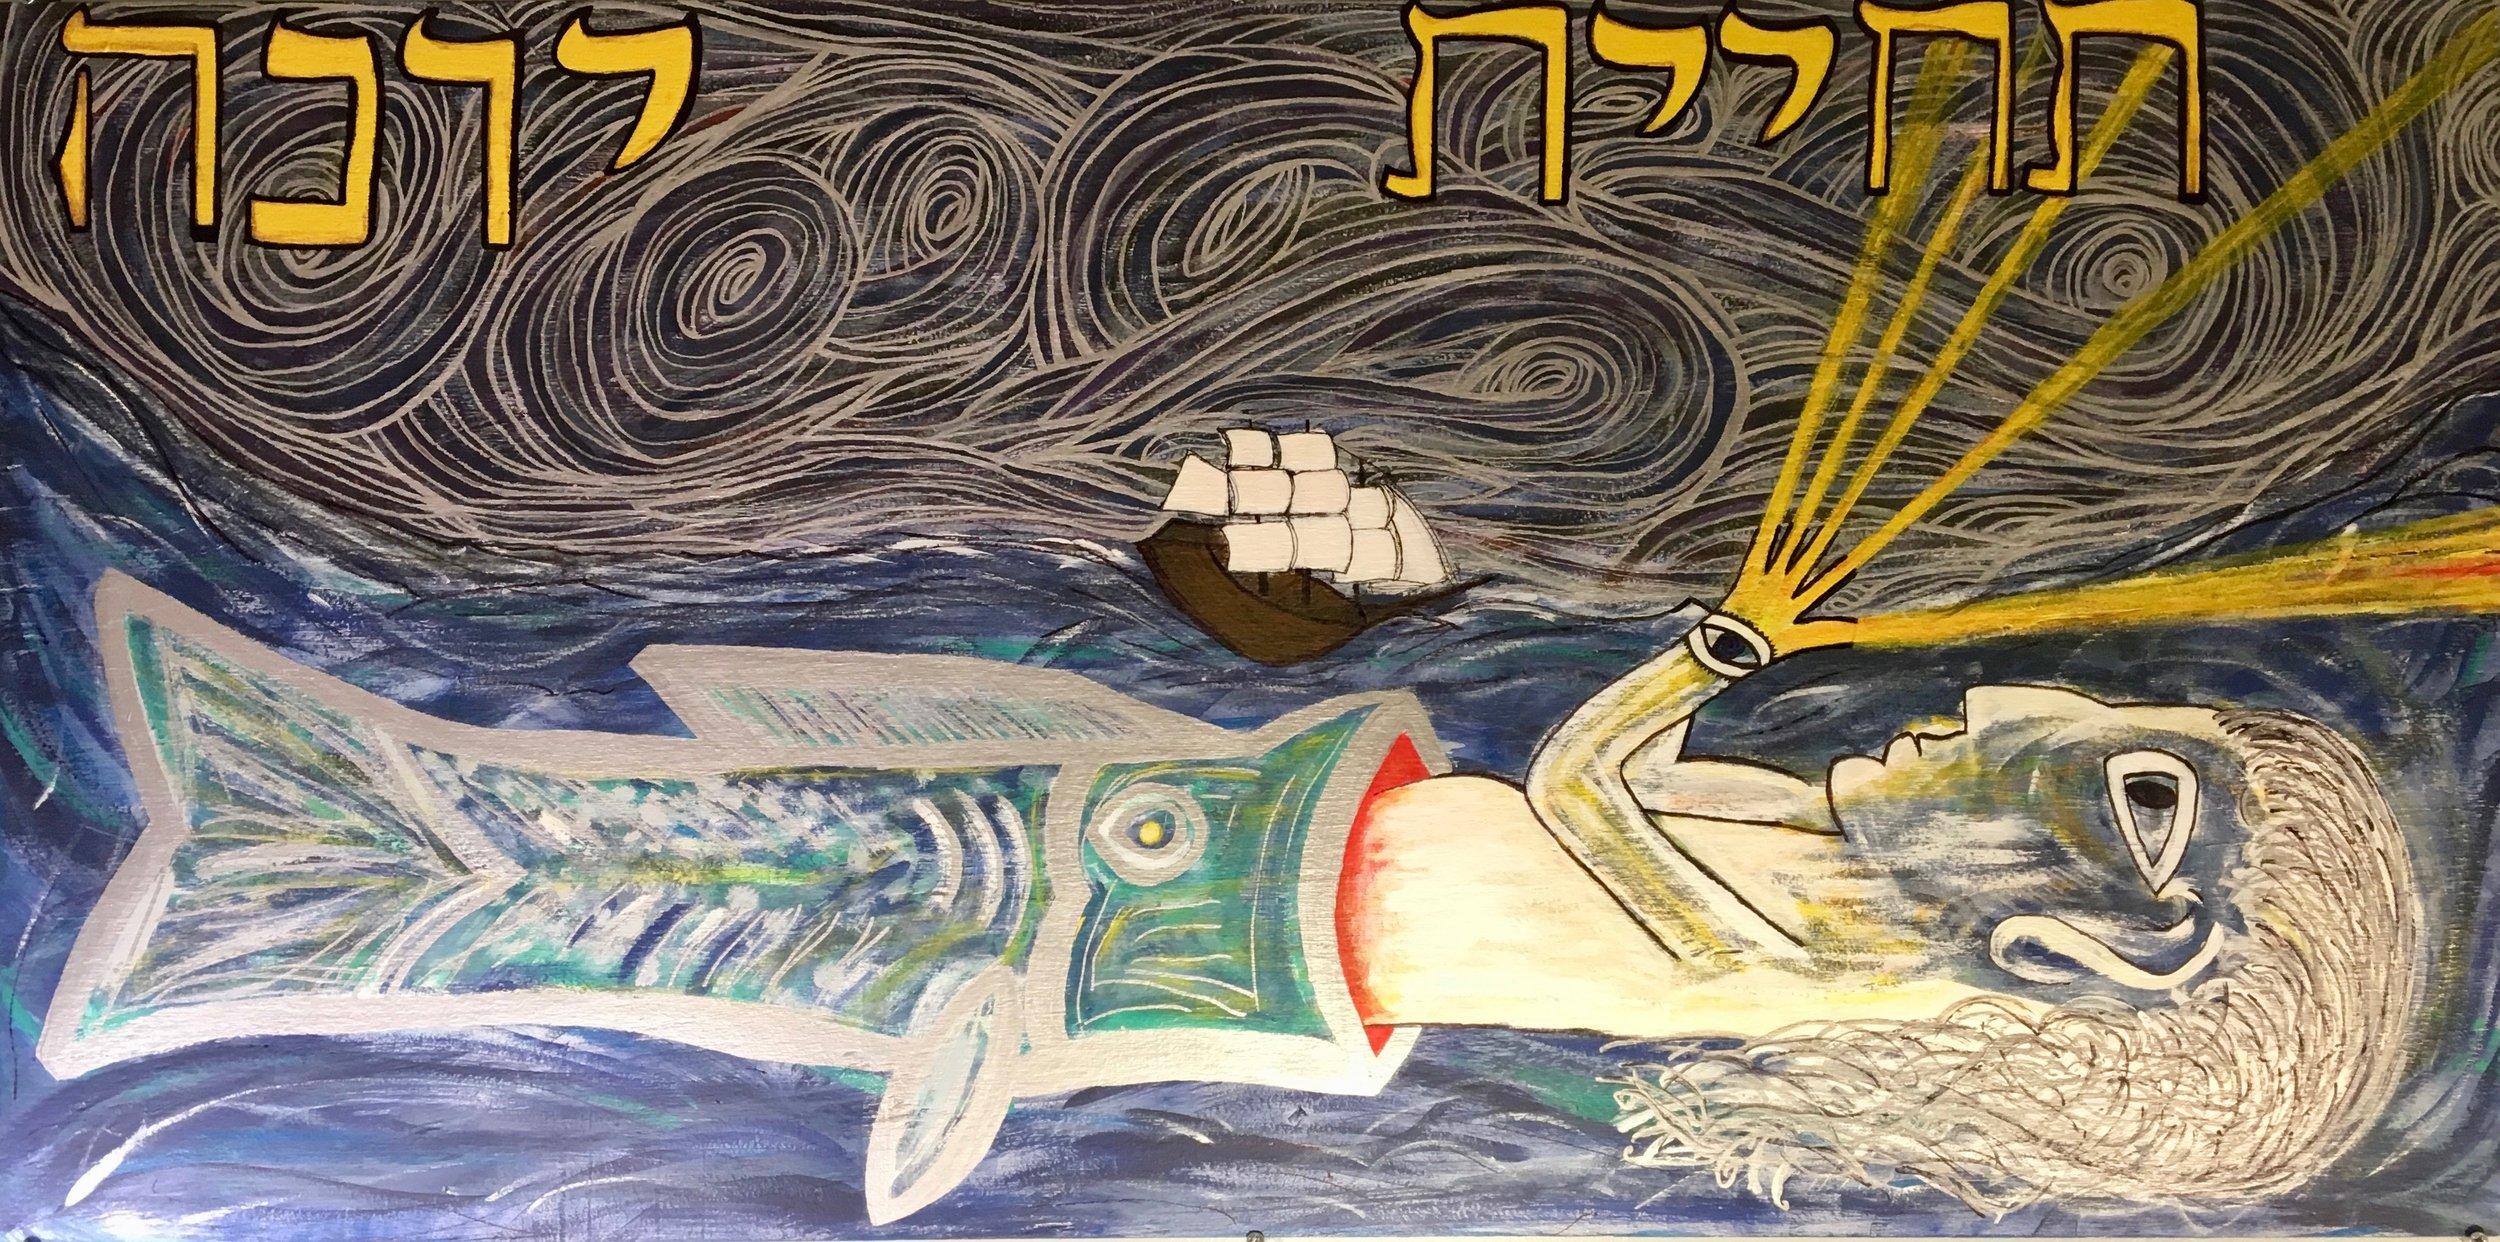 The Resurrection of Jonah - Mixed Media on 2x4 Wood Panel by Aaron Berg